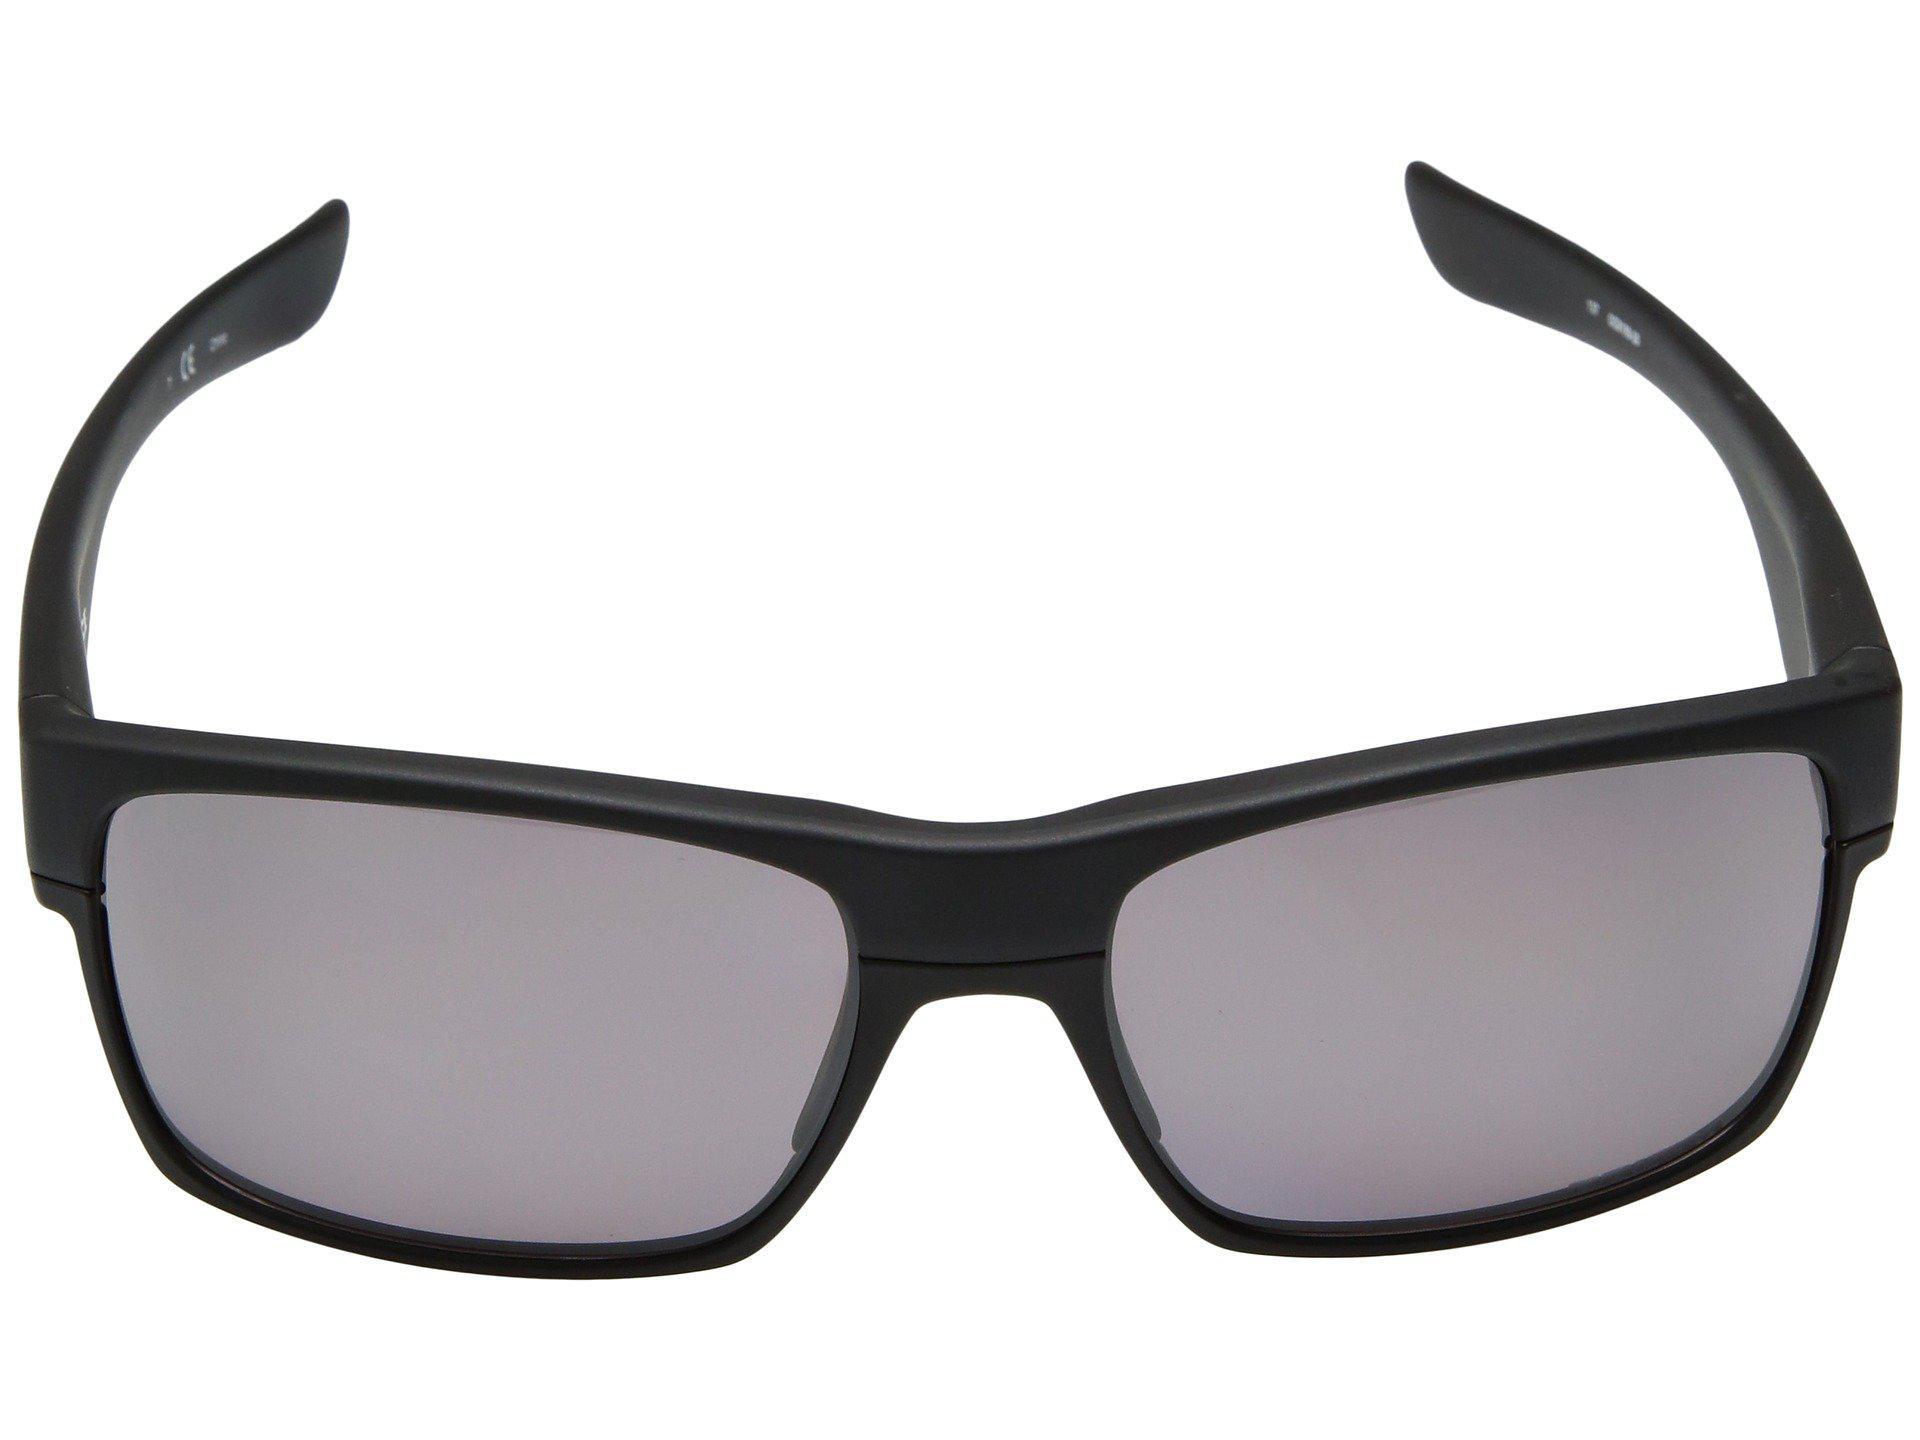 2a7457e61e Oakley - Two Face (matte Black grey Polarized) Sport Sunglasses for Men -.  View fullscreen